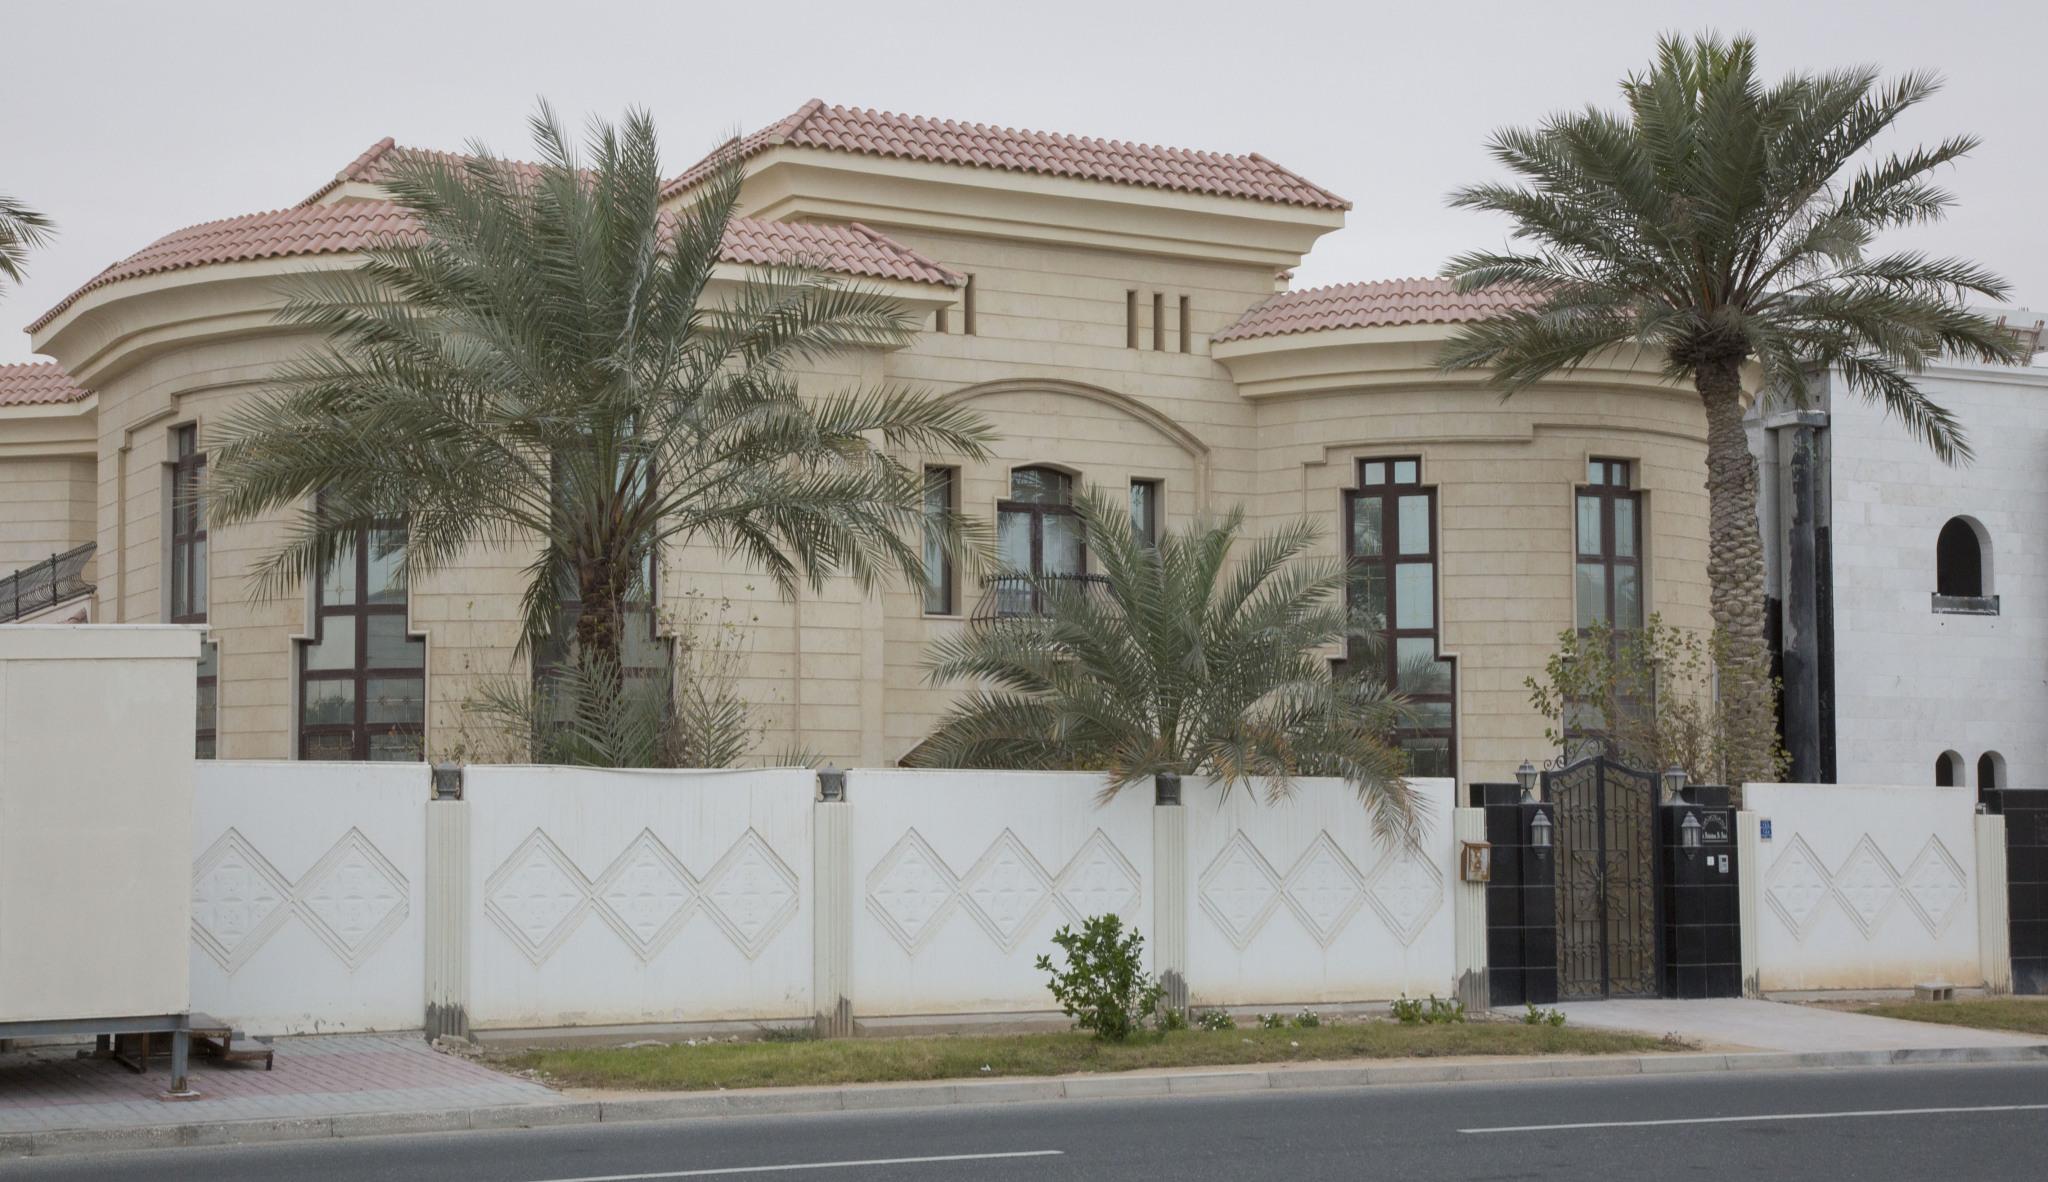 Qatari Home Design Engineering Consultants Qatar   Review ...